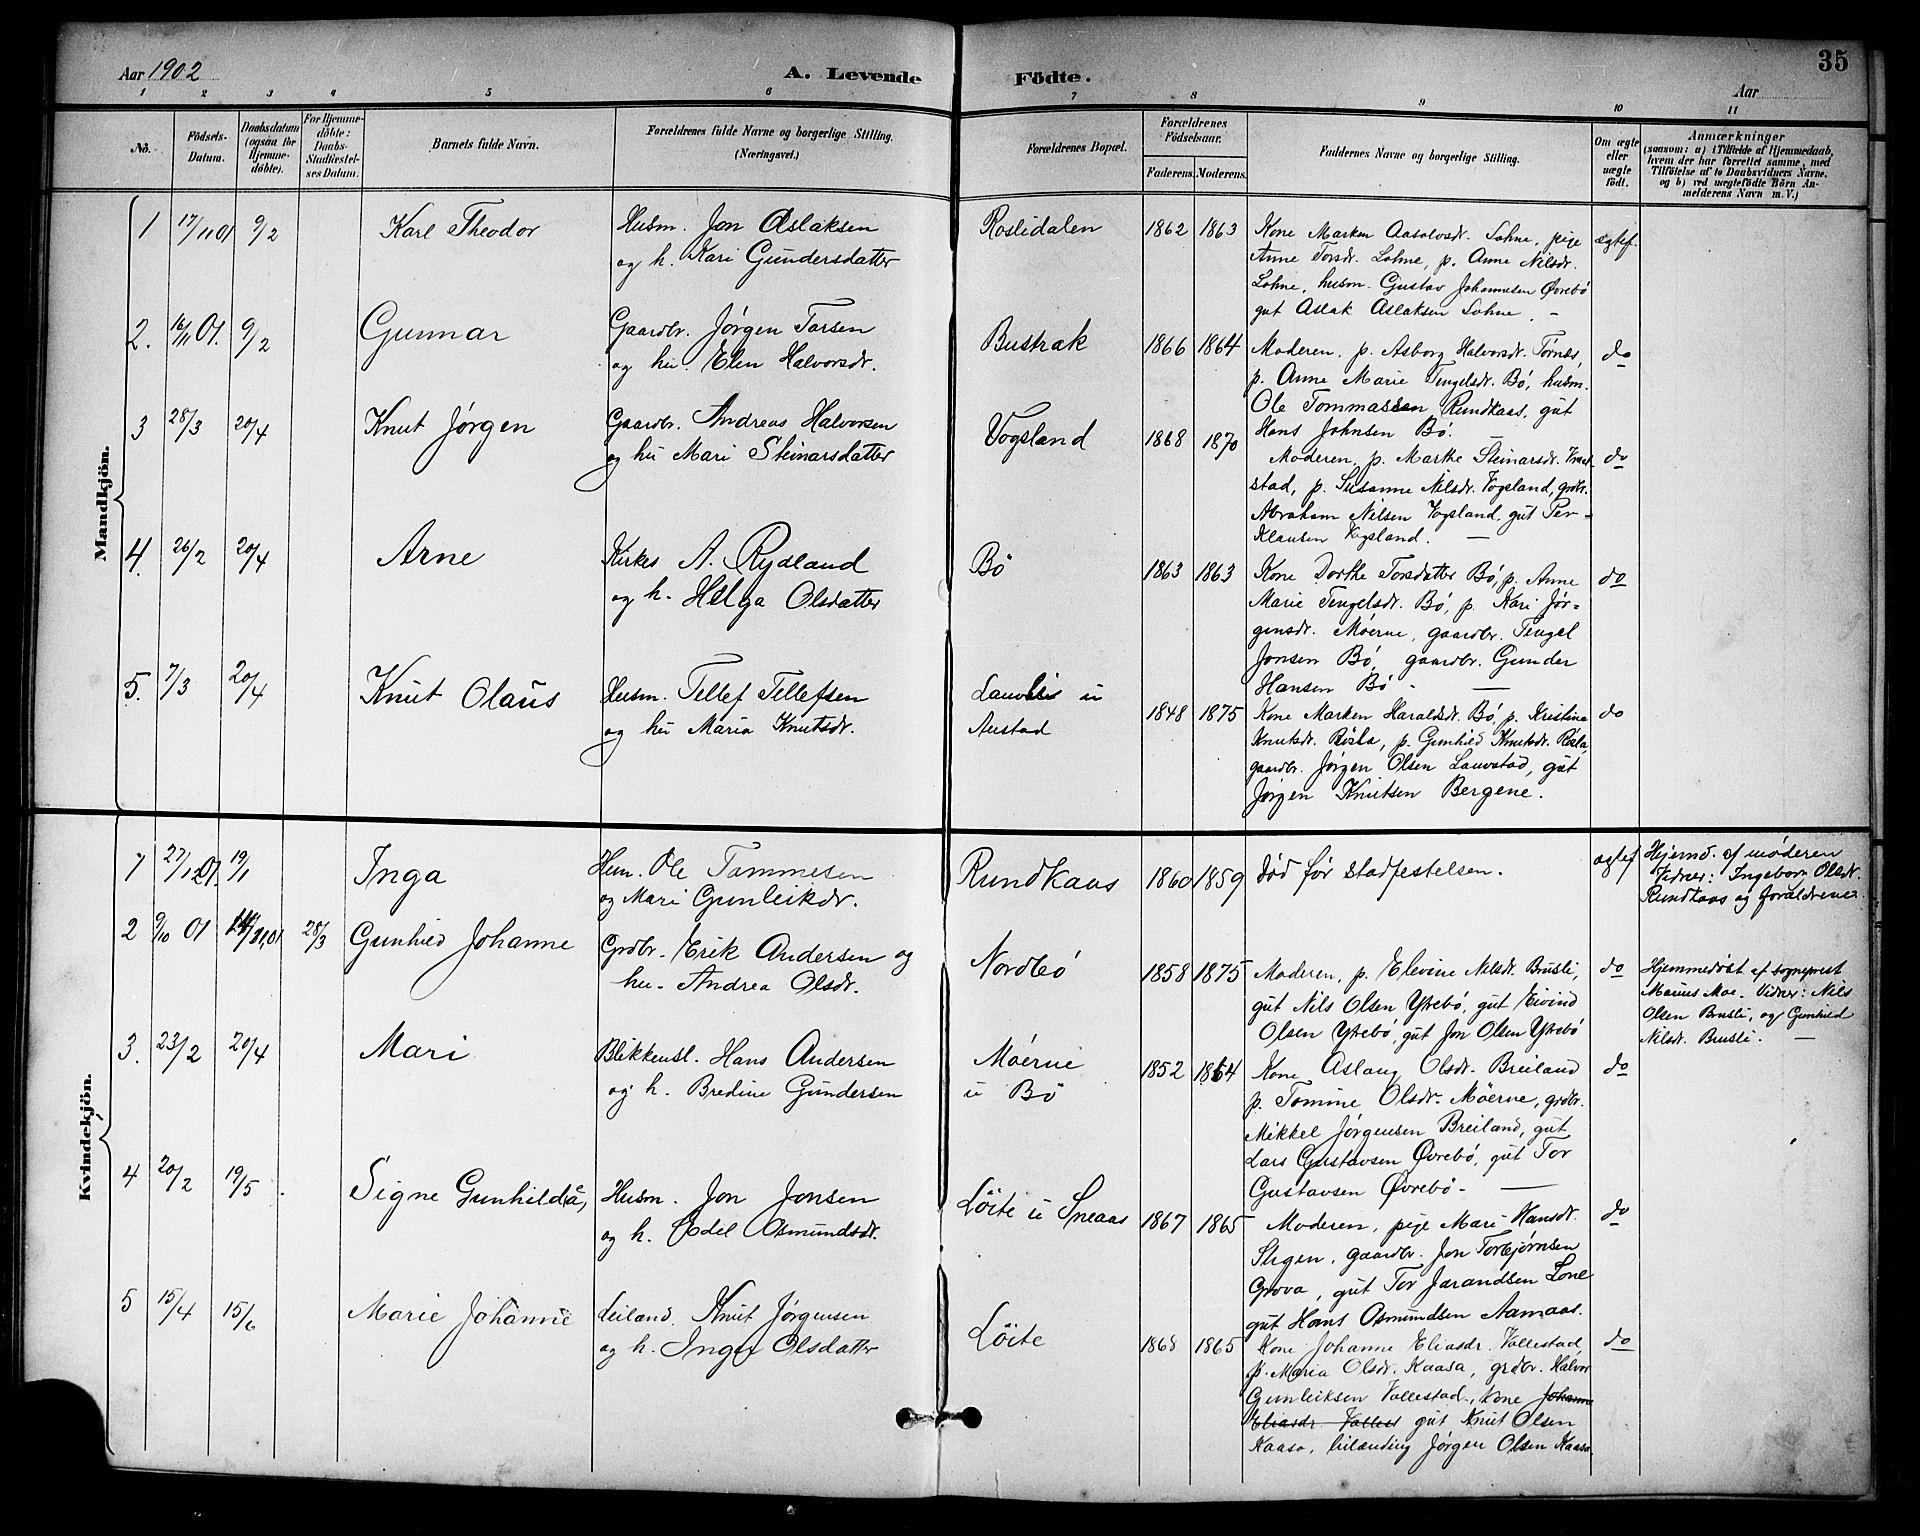 SAKO, Drangedal kirkebøker, G/Gb/L0002: Klokkerbok nr. II 2, 1895-1918, s. 35